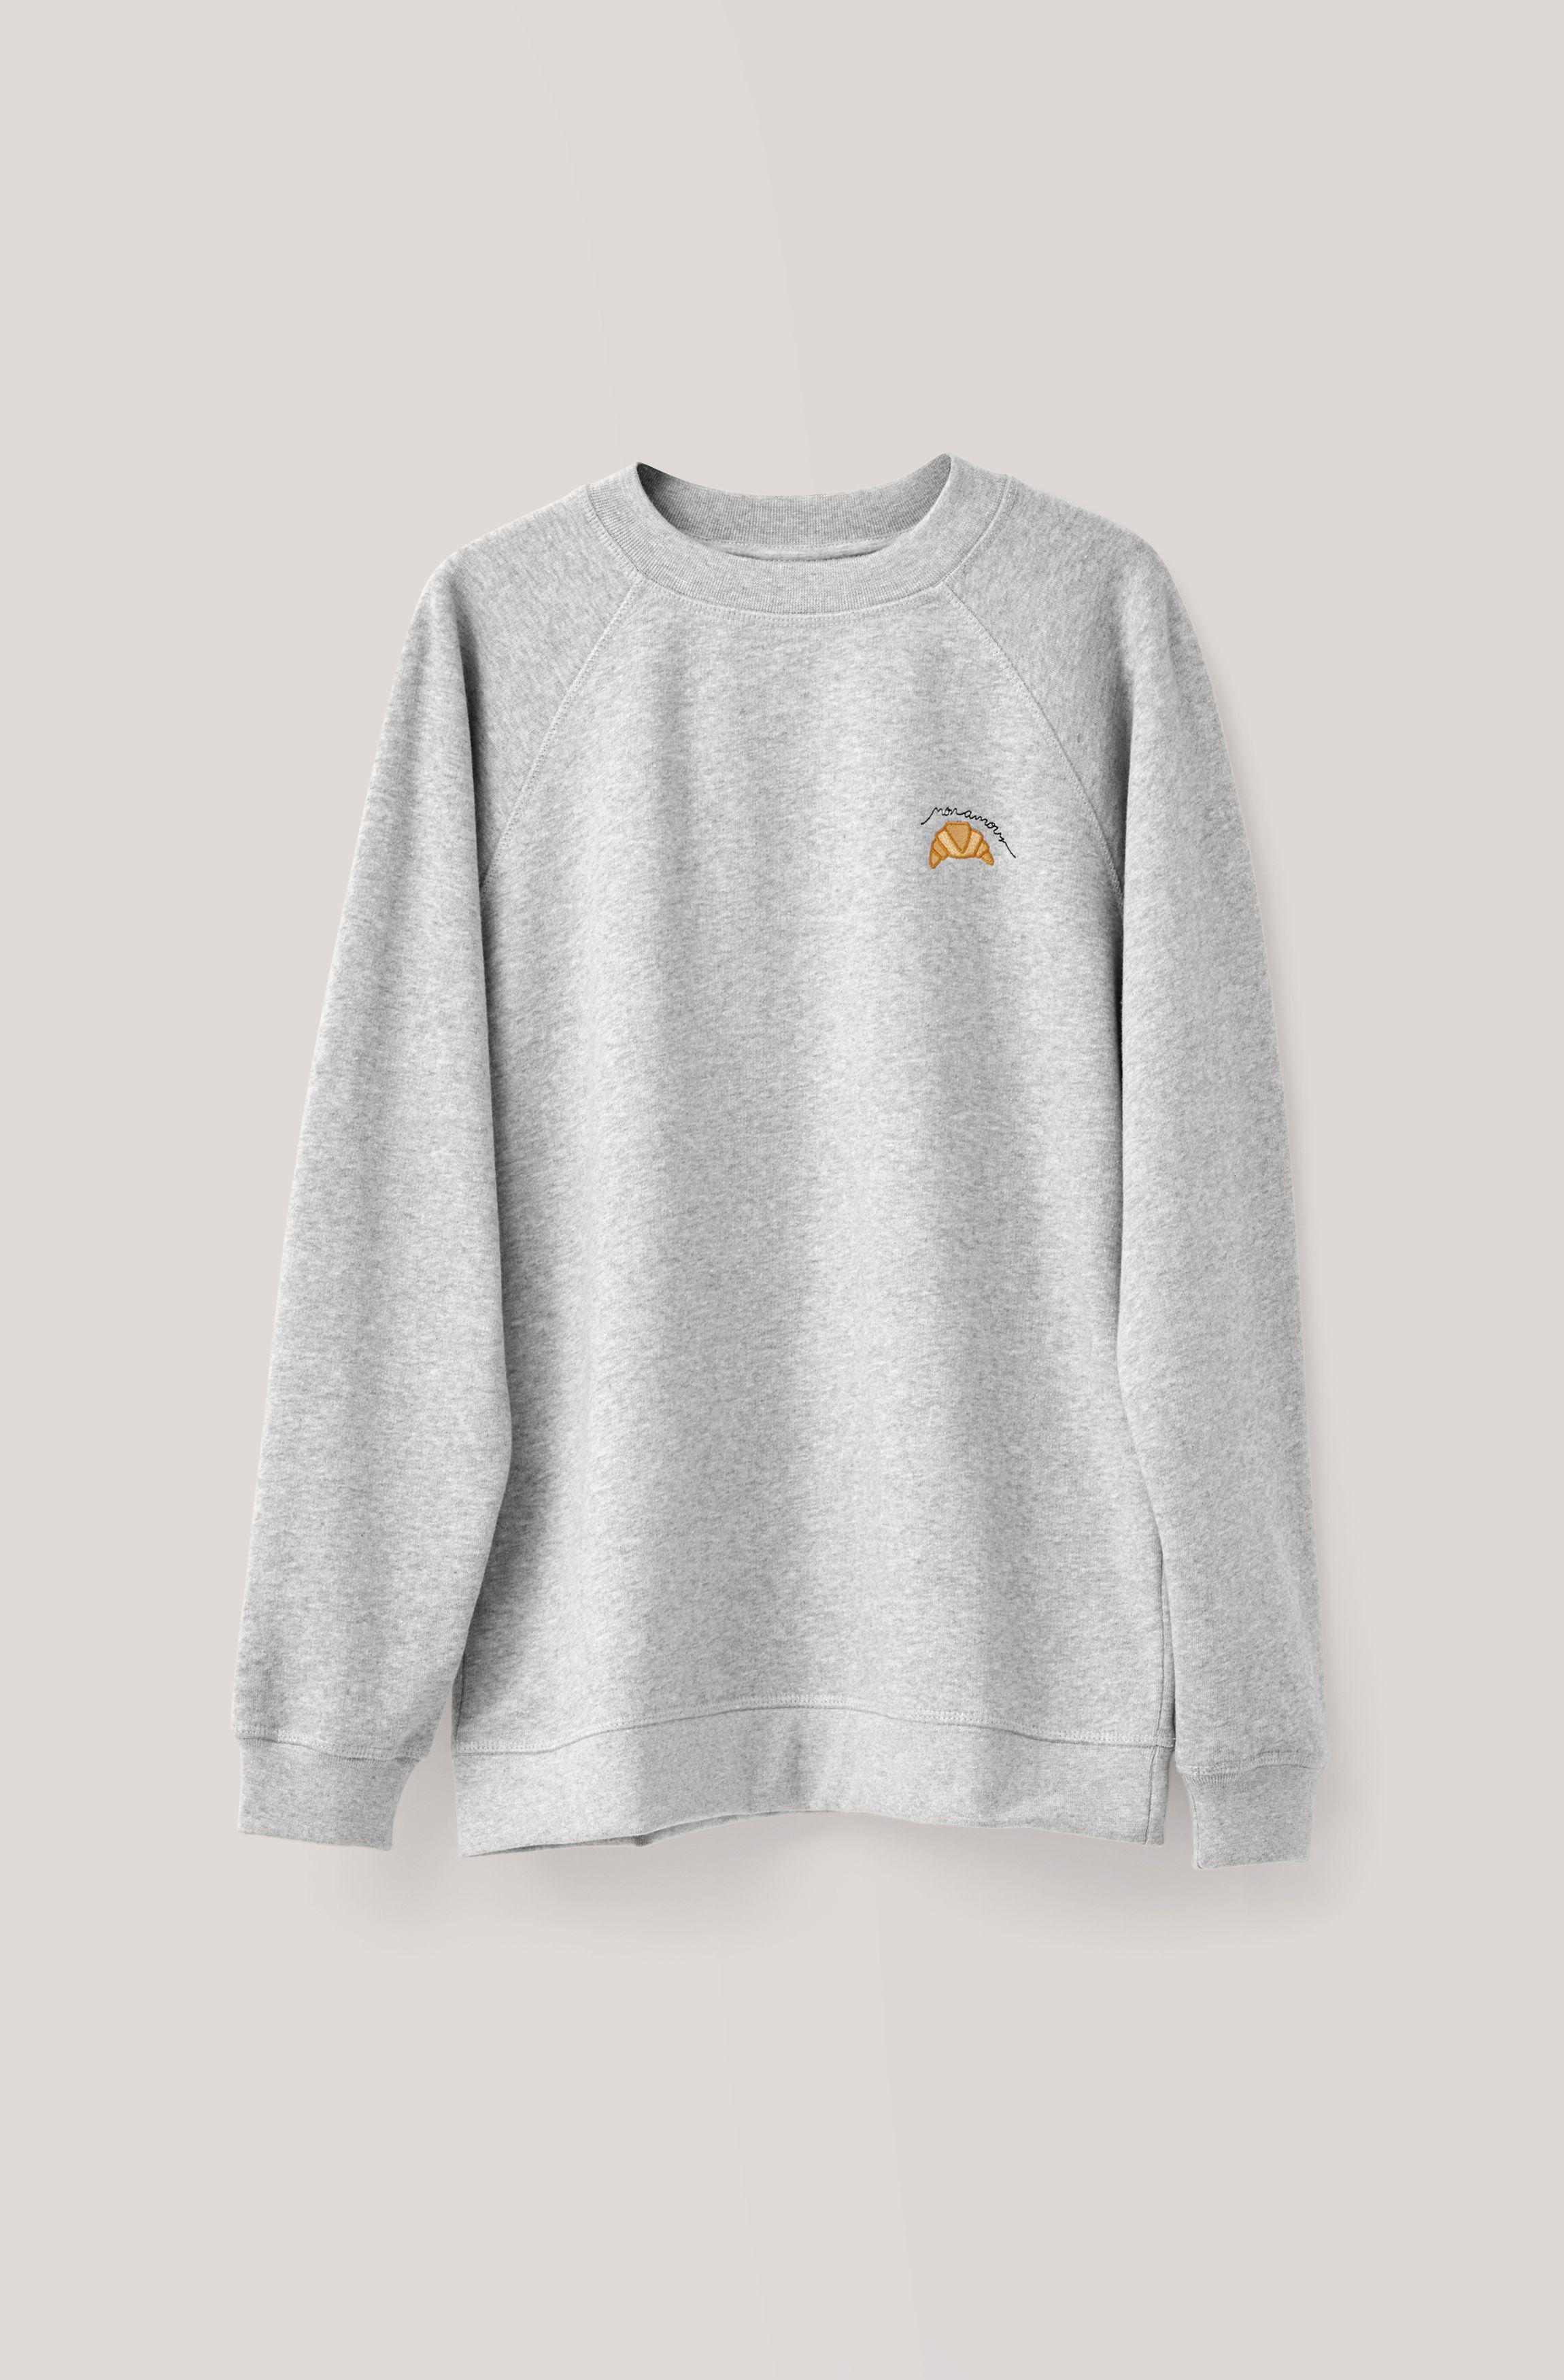 Leroy Isoli Sweatshirt Croissant Paloma Melange X Small Roupas Looks [ 3500 x 2300 Pixel ]